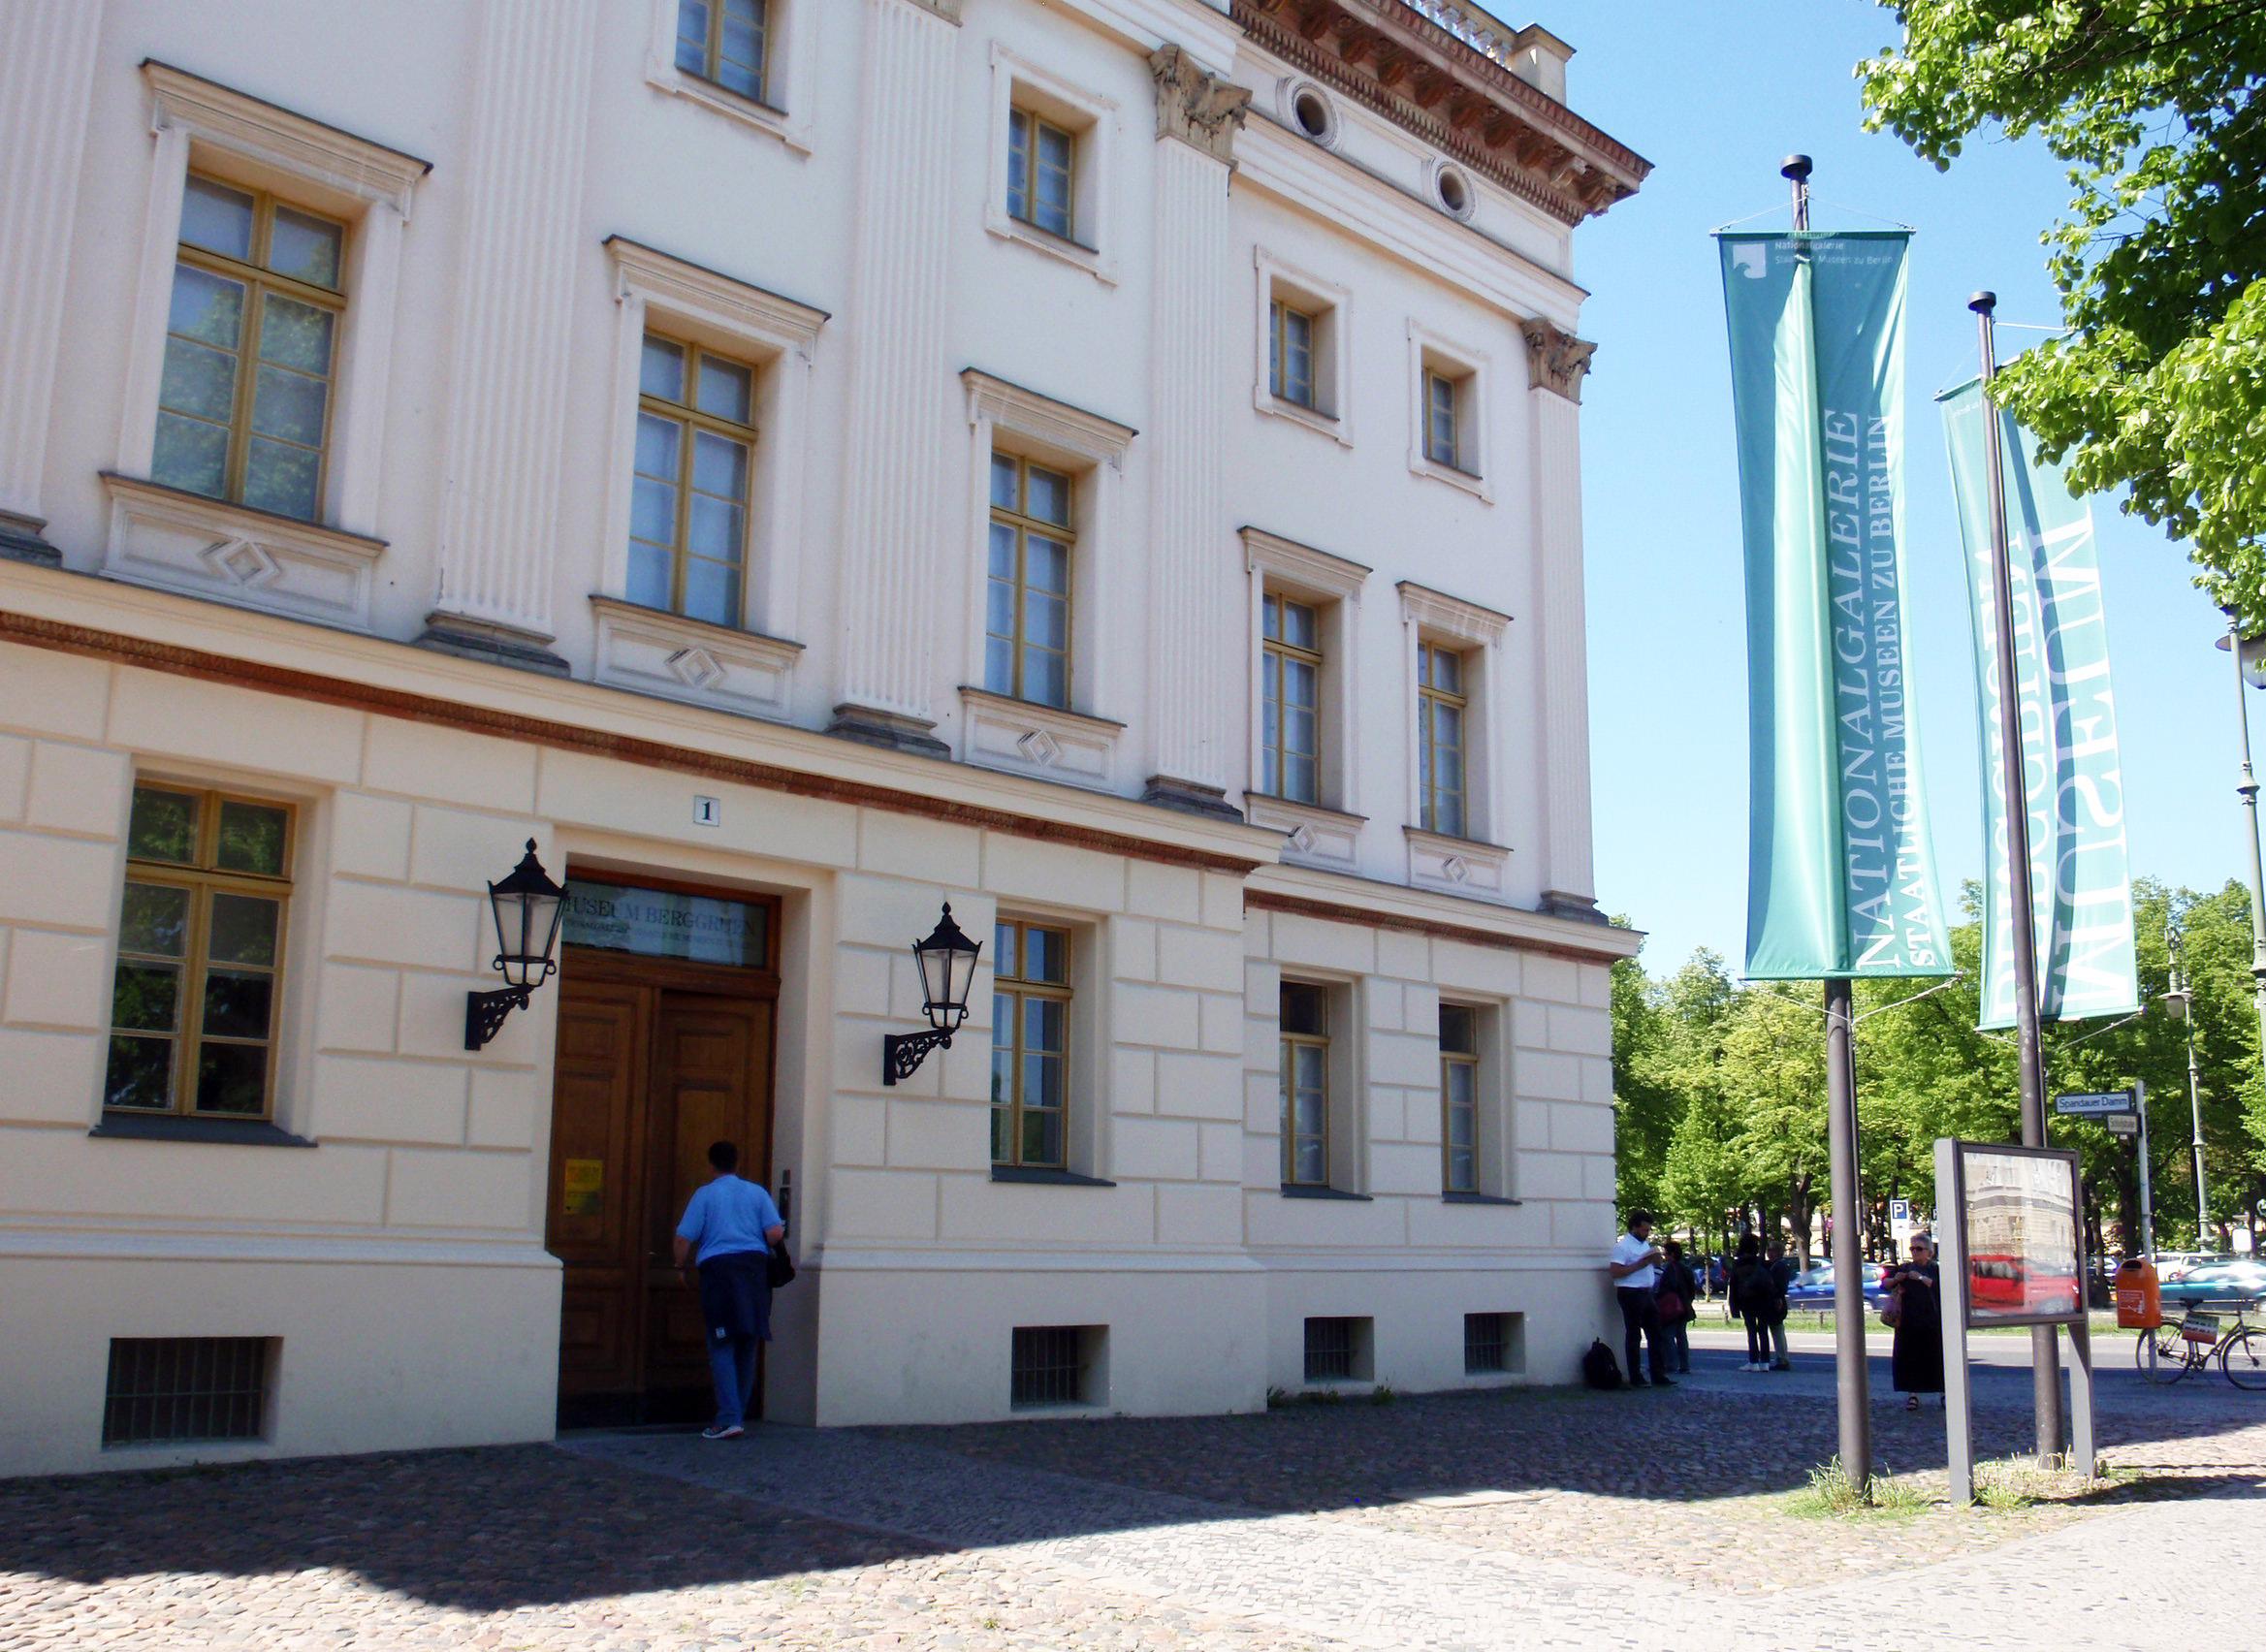 Museum Berggruen genåbnet